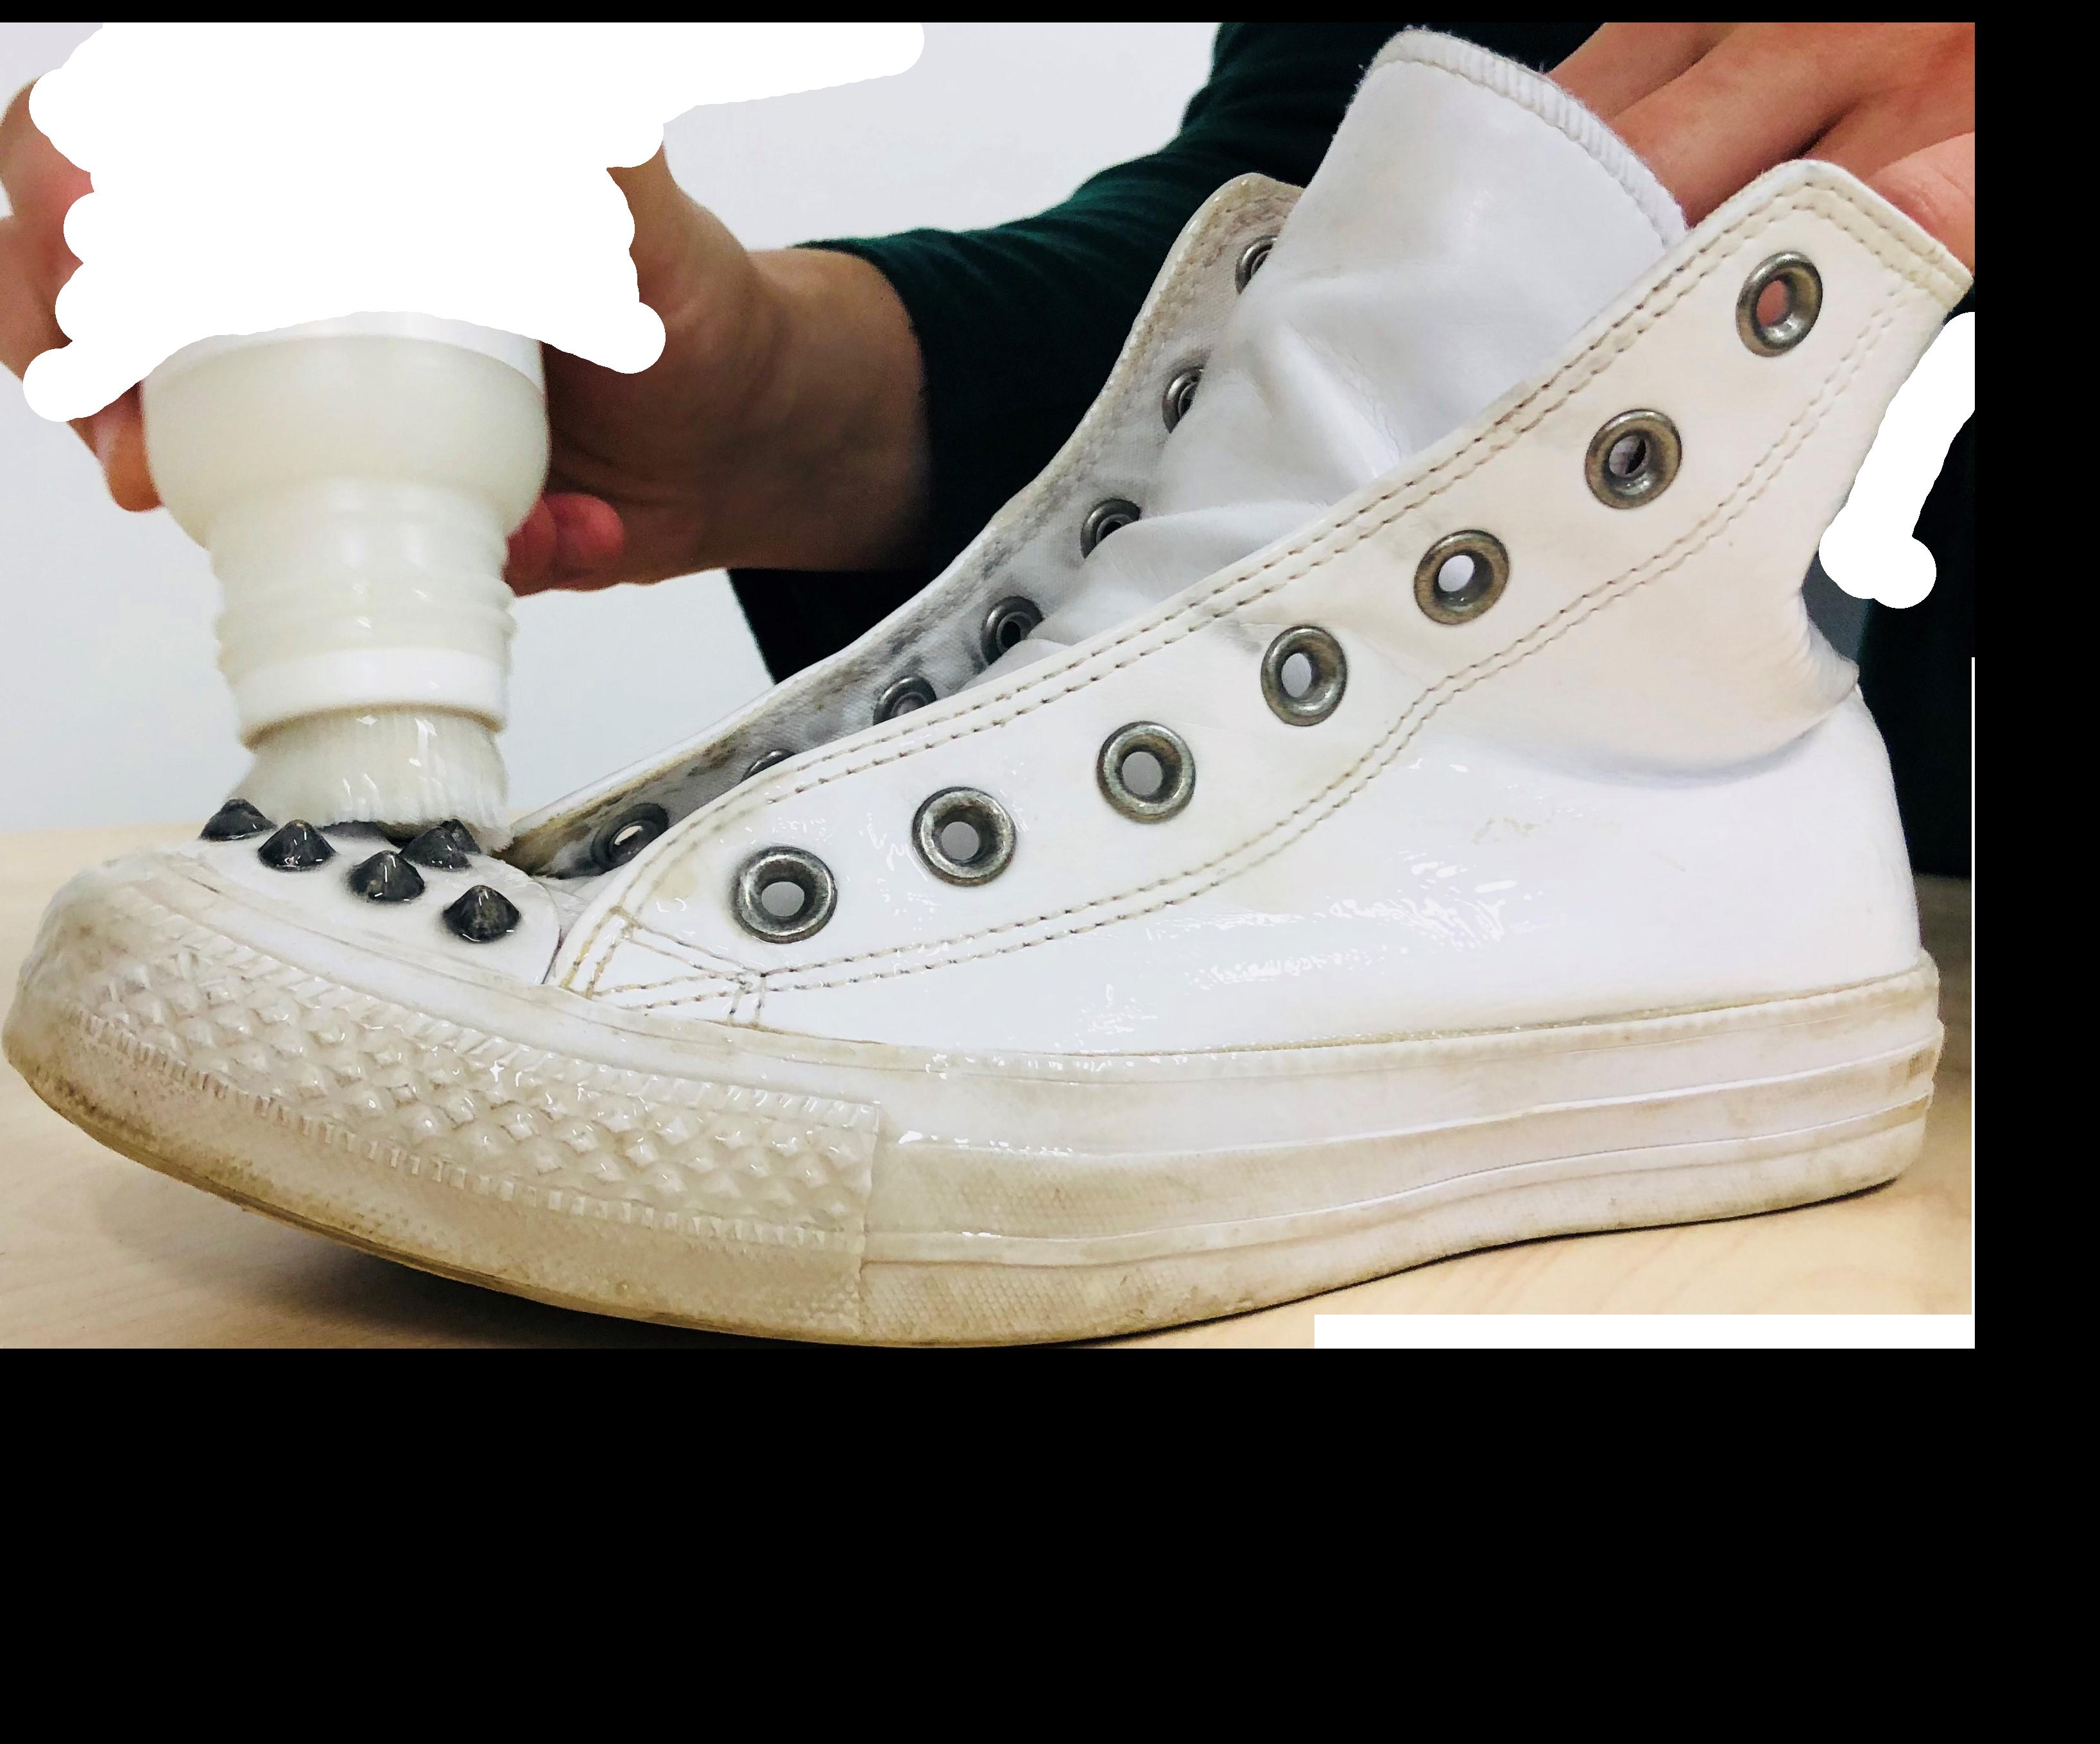 nettoyage de chaussure blanche